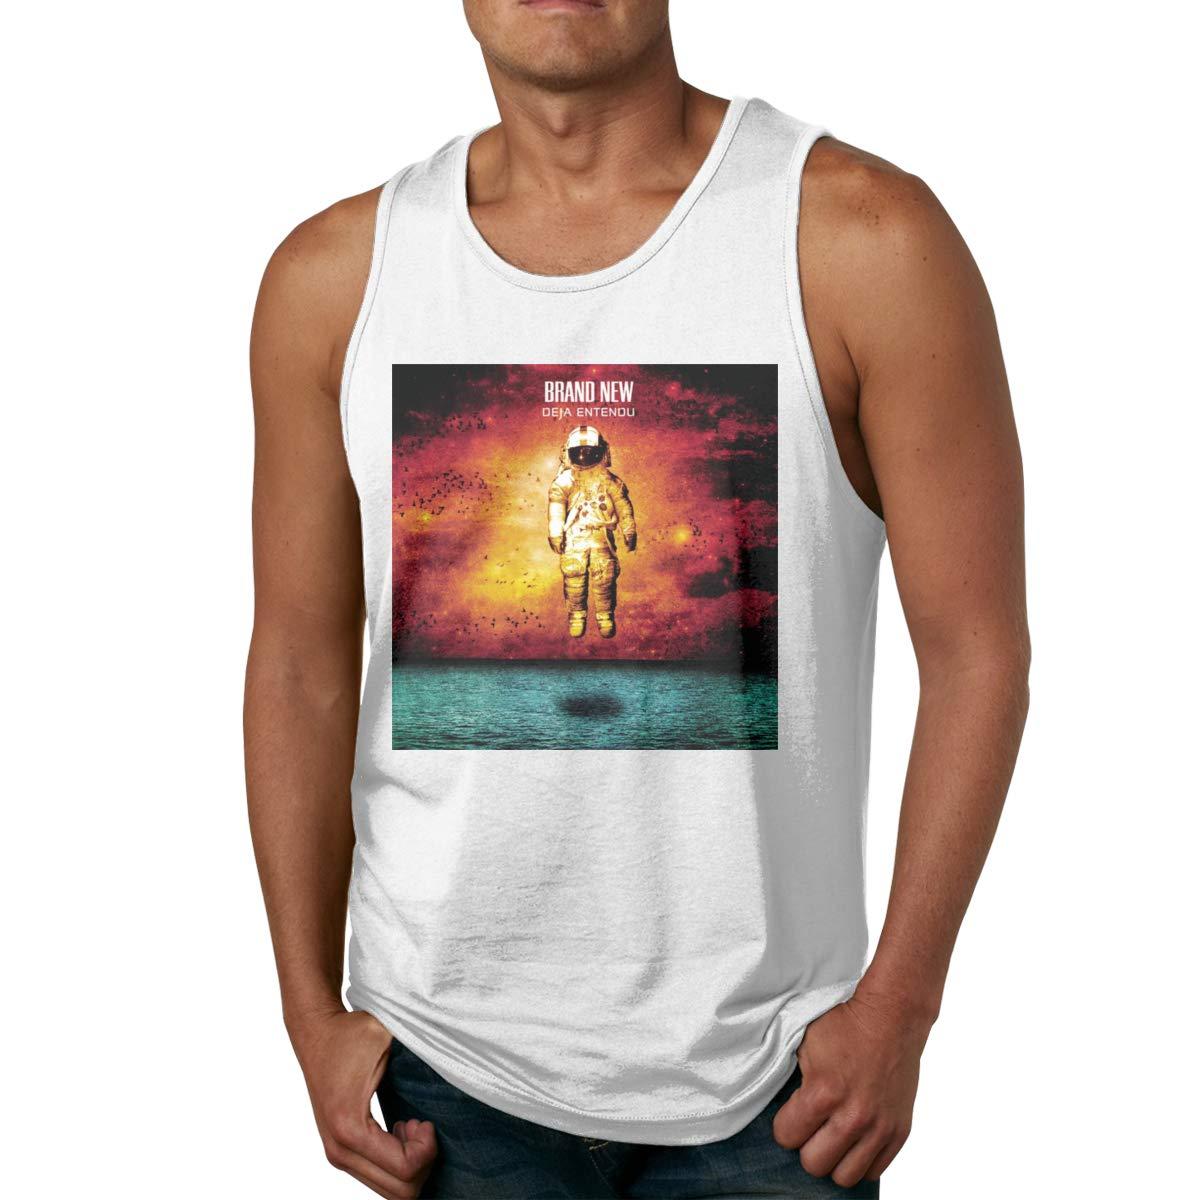 Deja Entendu Casual Style Jogging Sleeveless Tanks Top Shirts